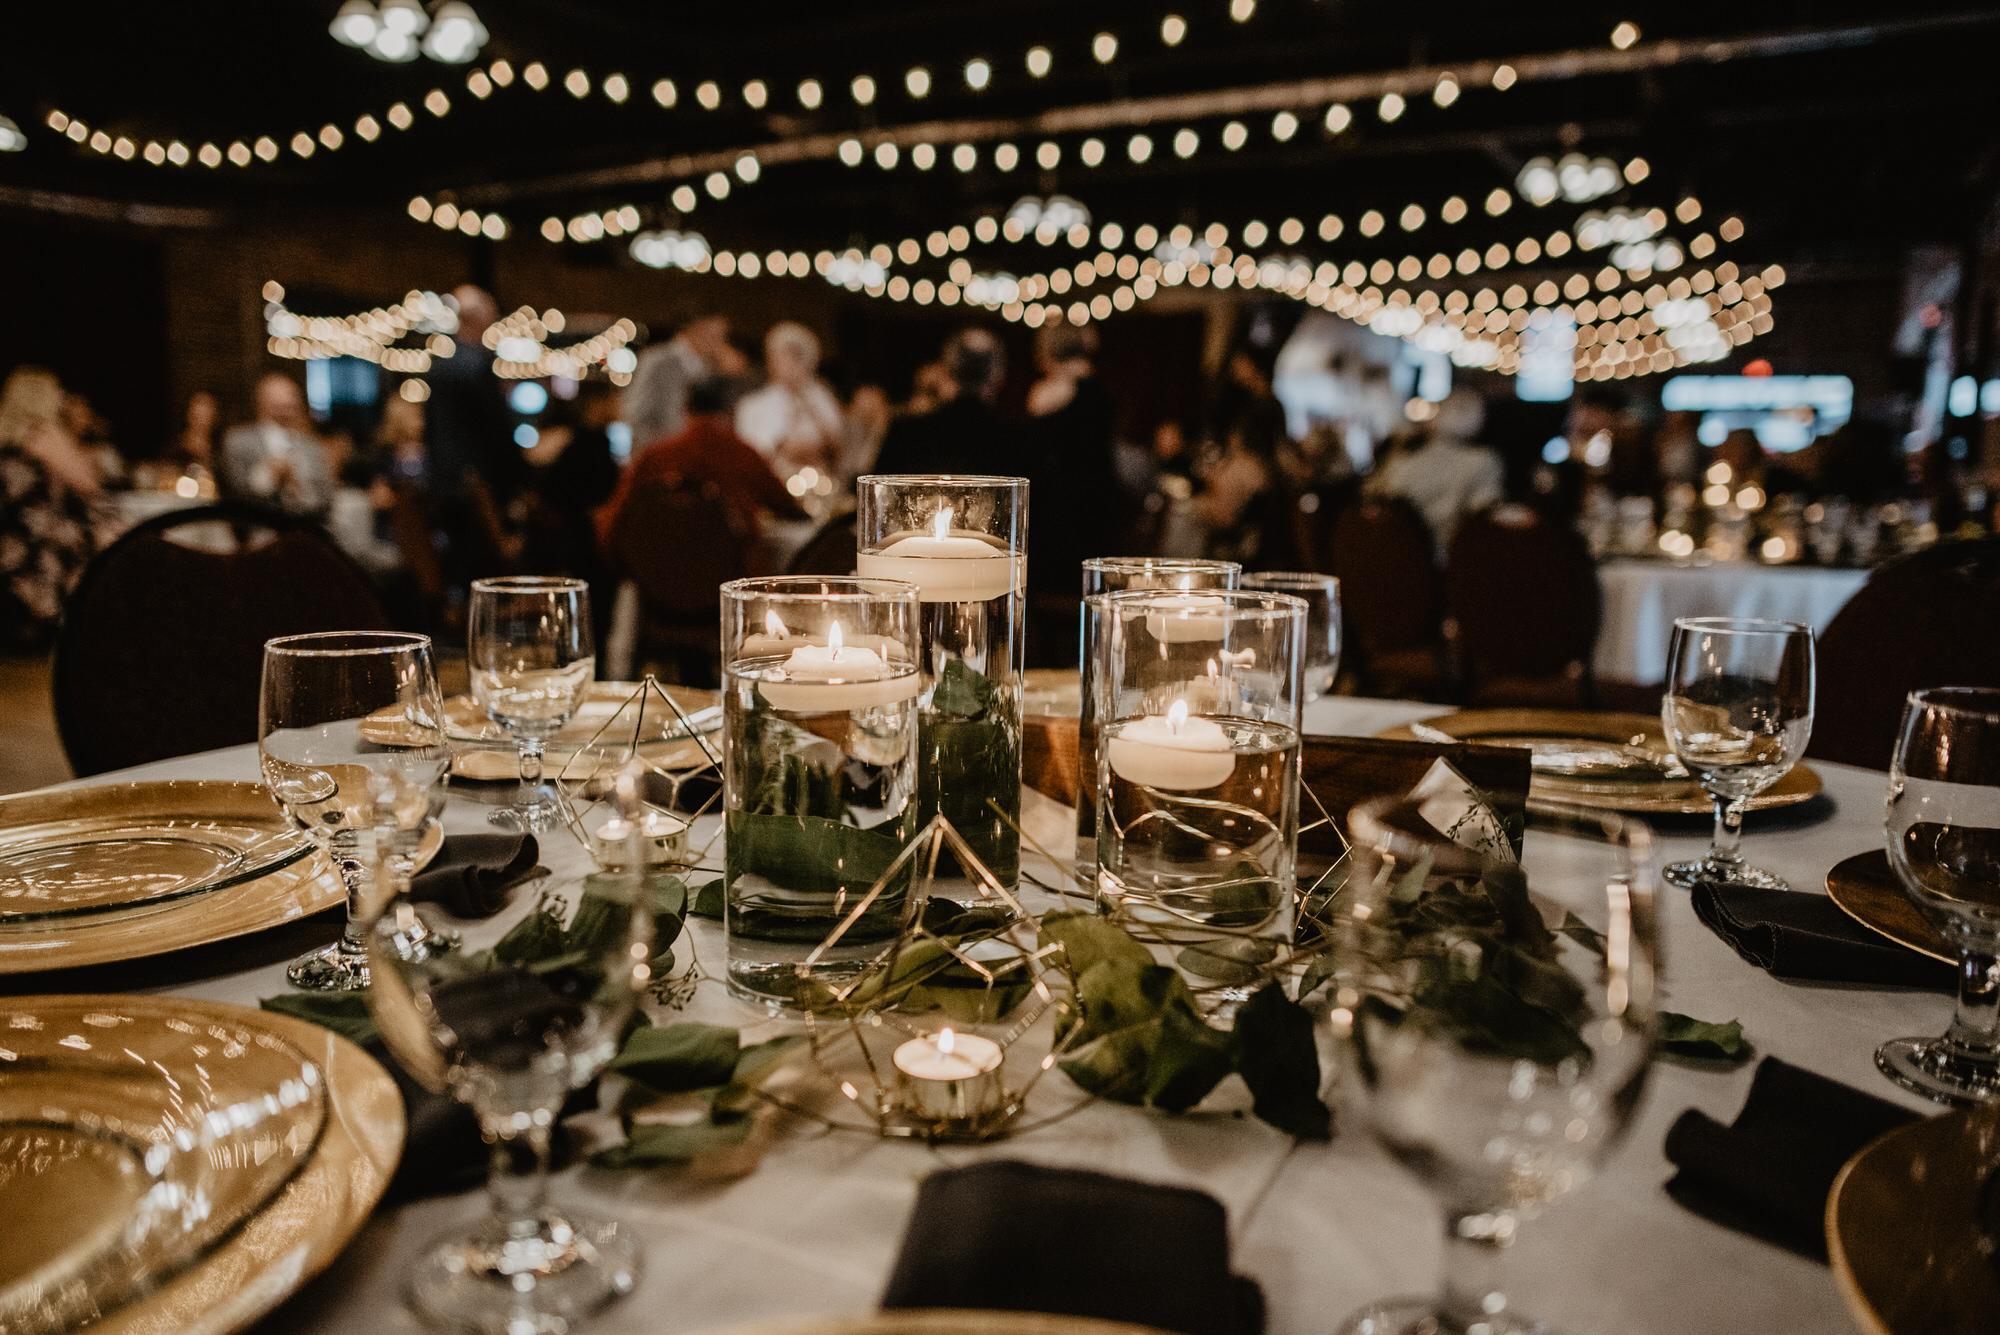 Kaylie_Sirek_Photography_Grand_Island_Kearney_Hastings_Lincoln_Nebraska_Wedding_Engagement_Grandma_Grandparent_Delray_Downtown_DowntownLincoln_LNK_Emotional_Bride_Groom_Photographer_61.jpg